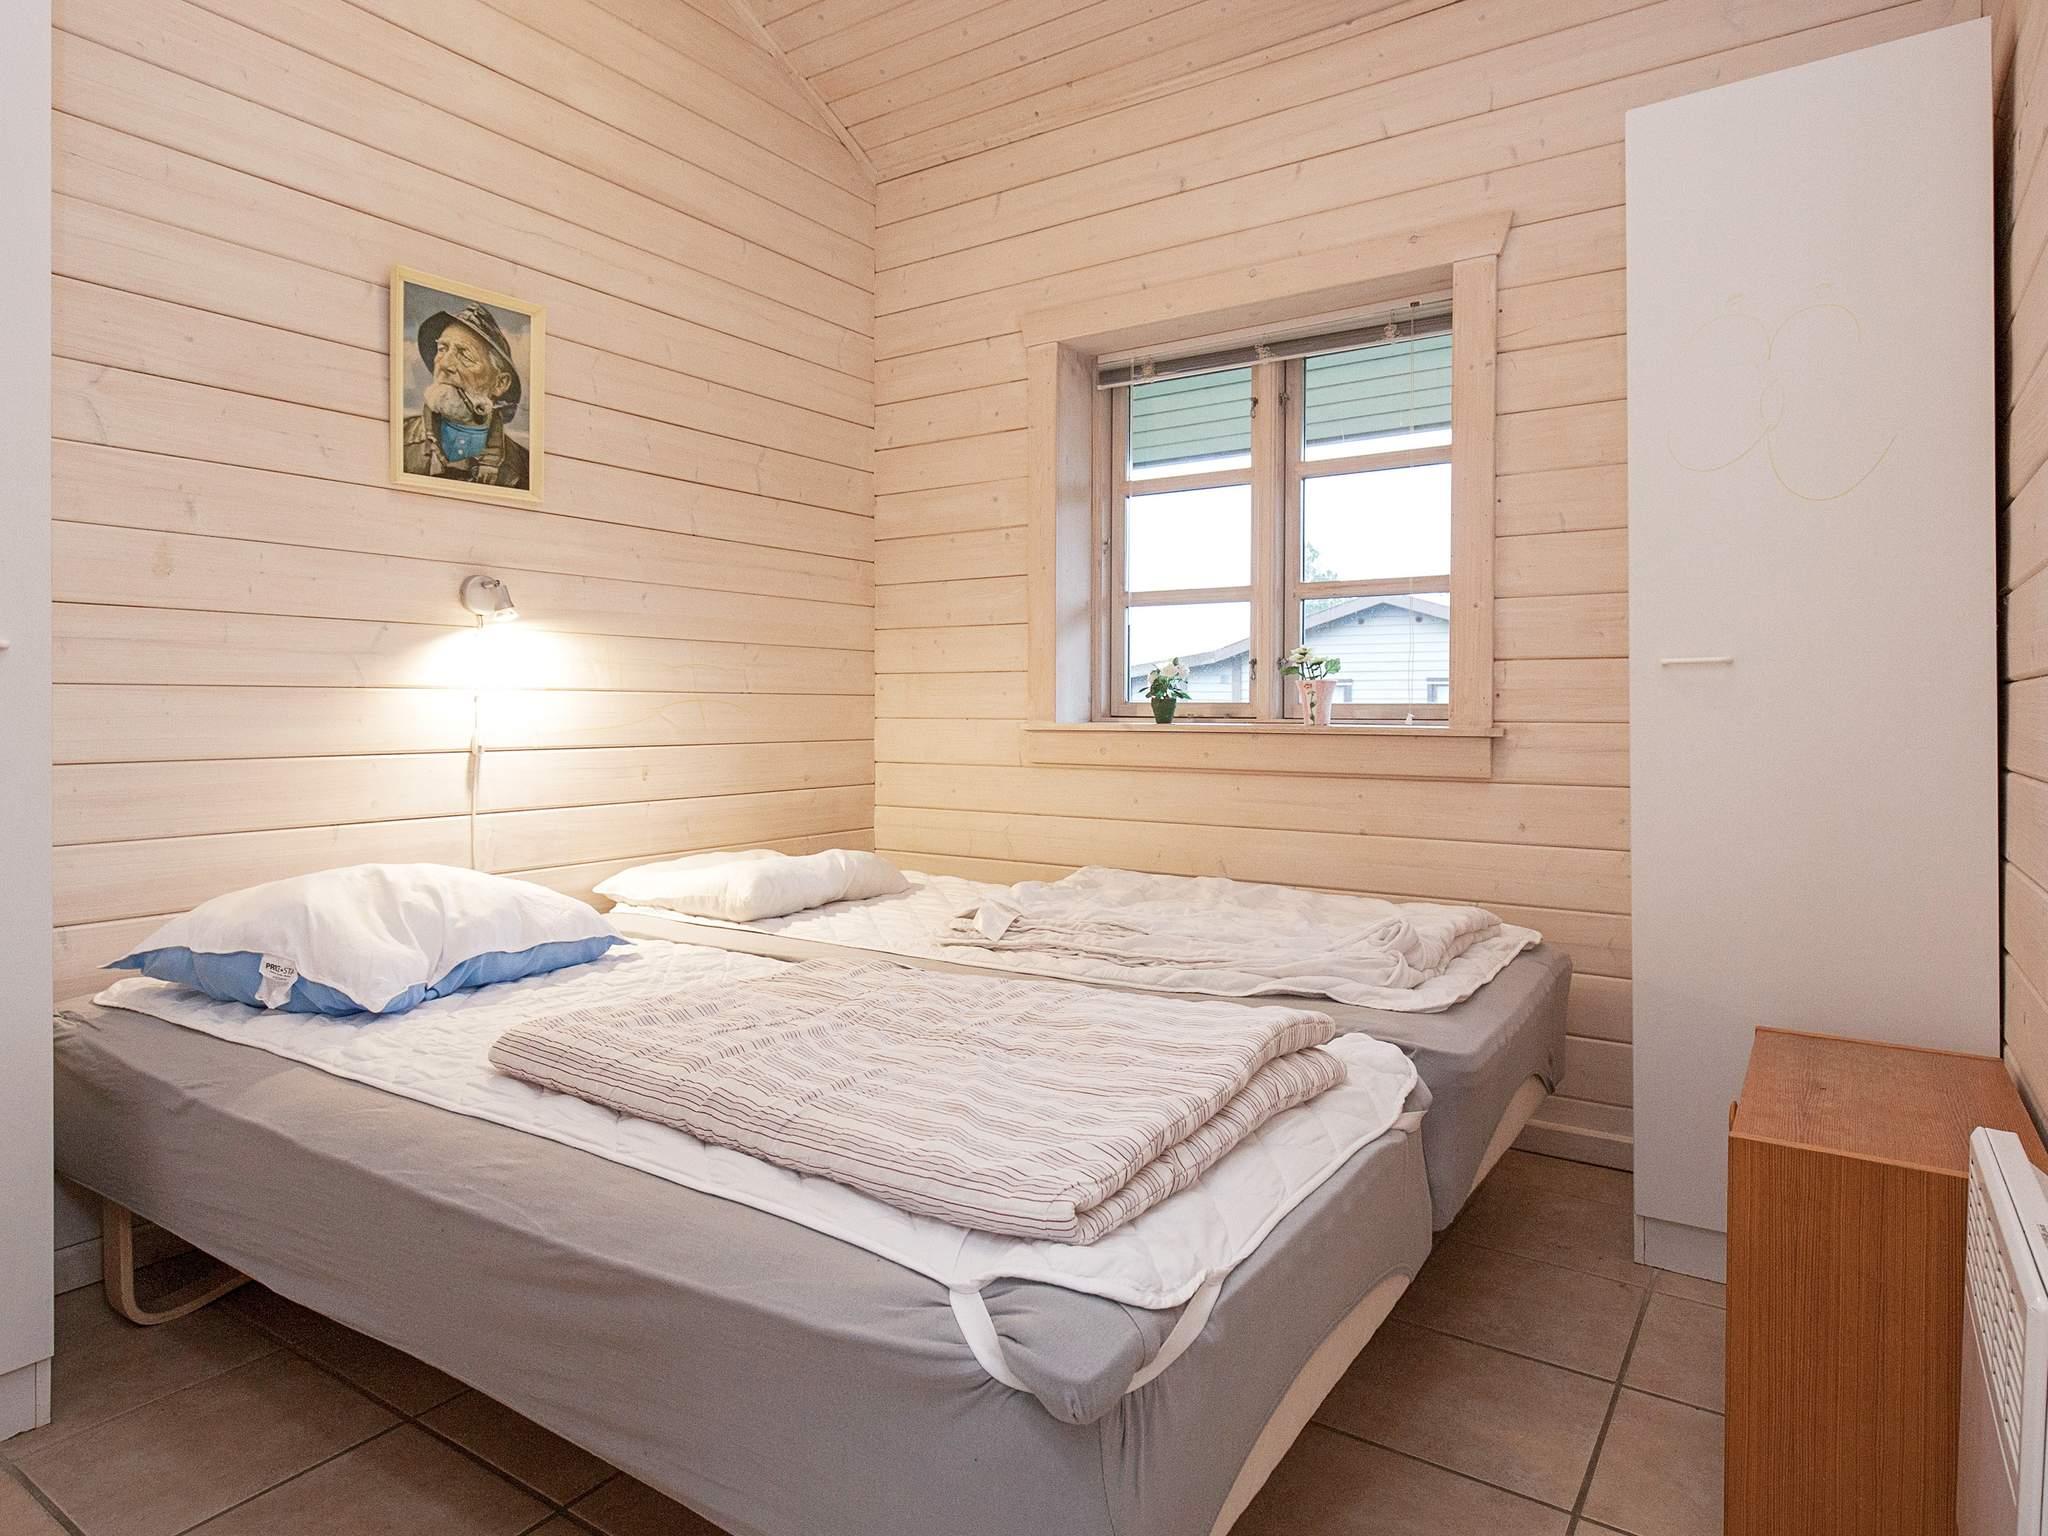 Ferienhaus Røsnæs (264063), Kalundborg, , Westseeland, Dänemark, Bild 18